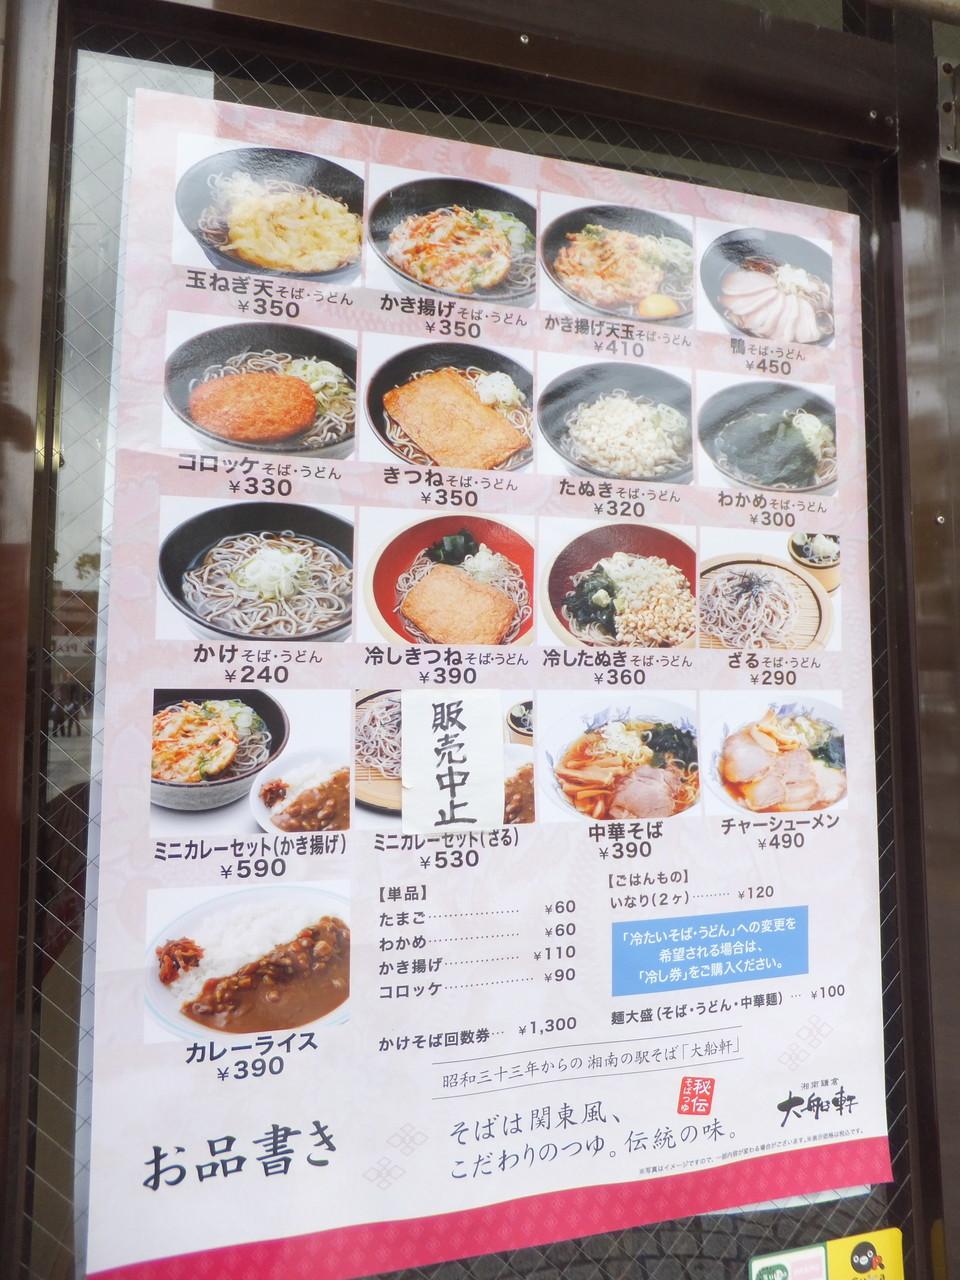 https://livedoor.blogimg.jp/shibapochi_kazu/imgs/7/b/7b01ce12.jpg